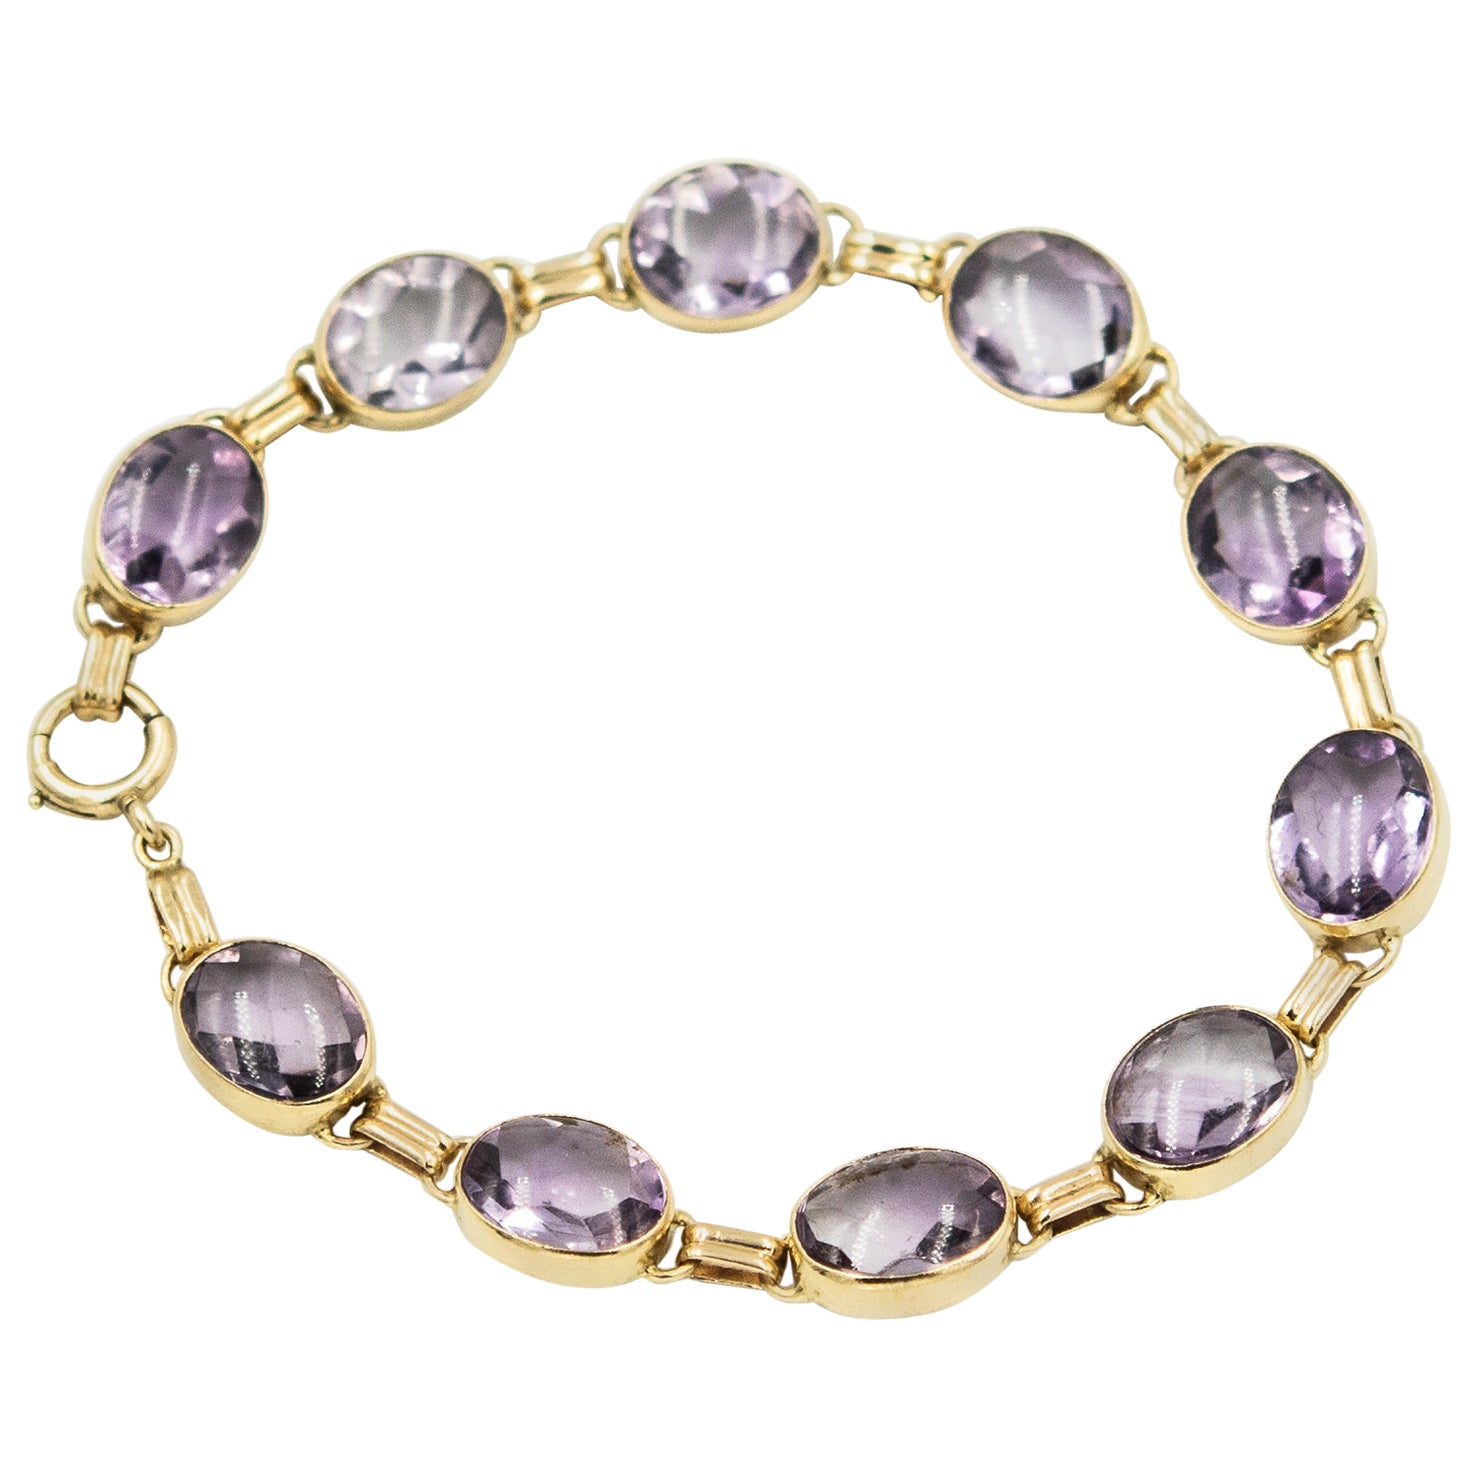 1940s Retro Oval Amethyst Link Gold Bracelet